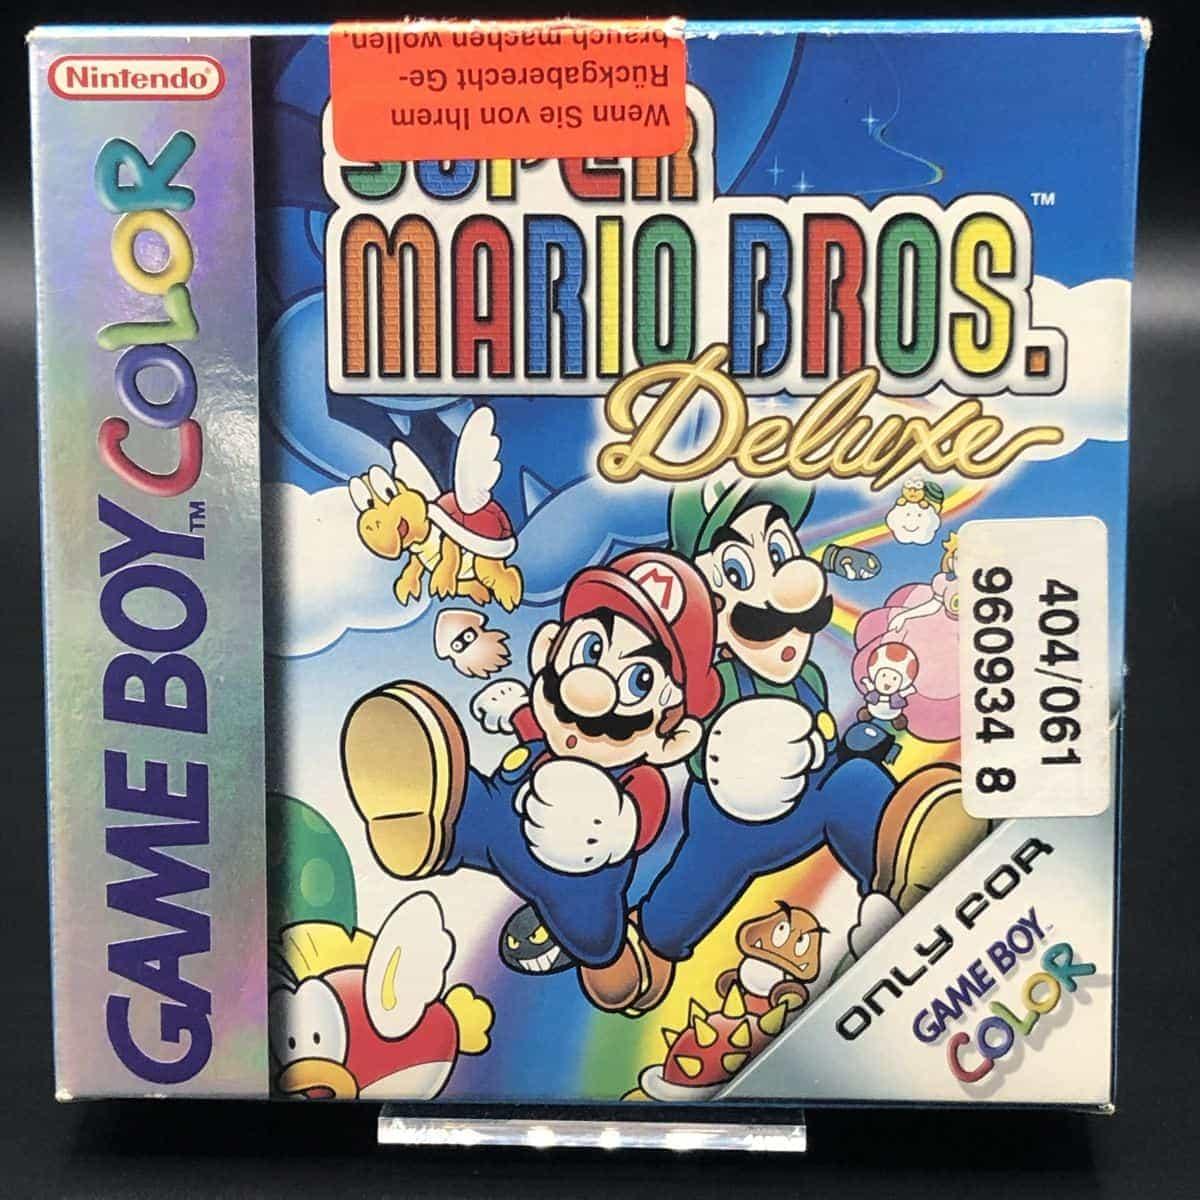 GBC Super Mario Bros. Deluxe (Komplett) (Gut) Nintendo Game Boy Color